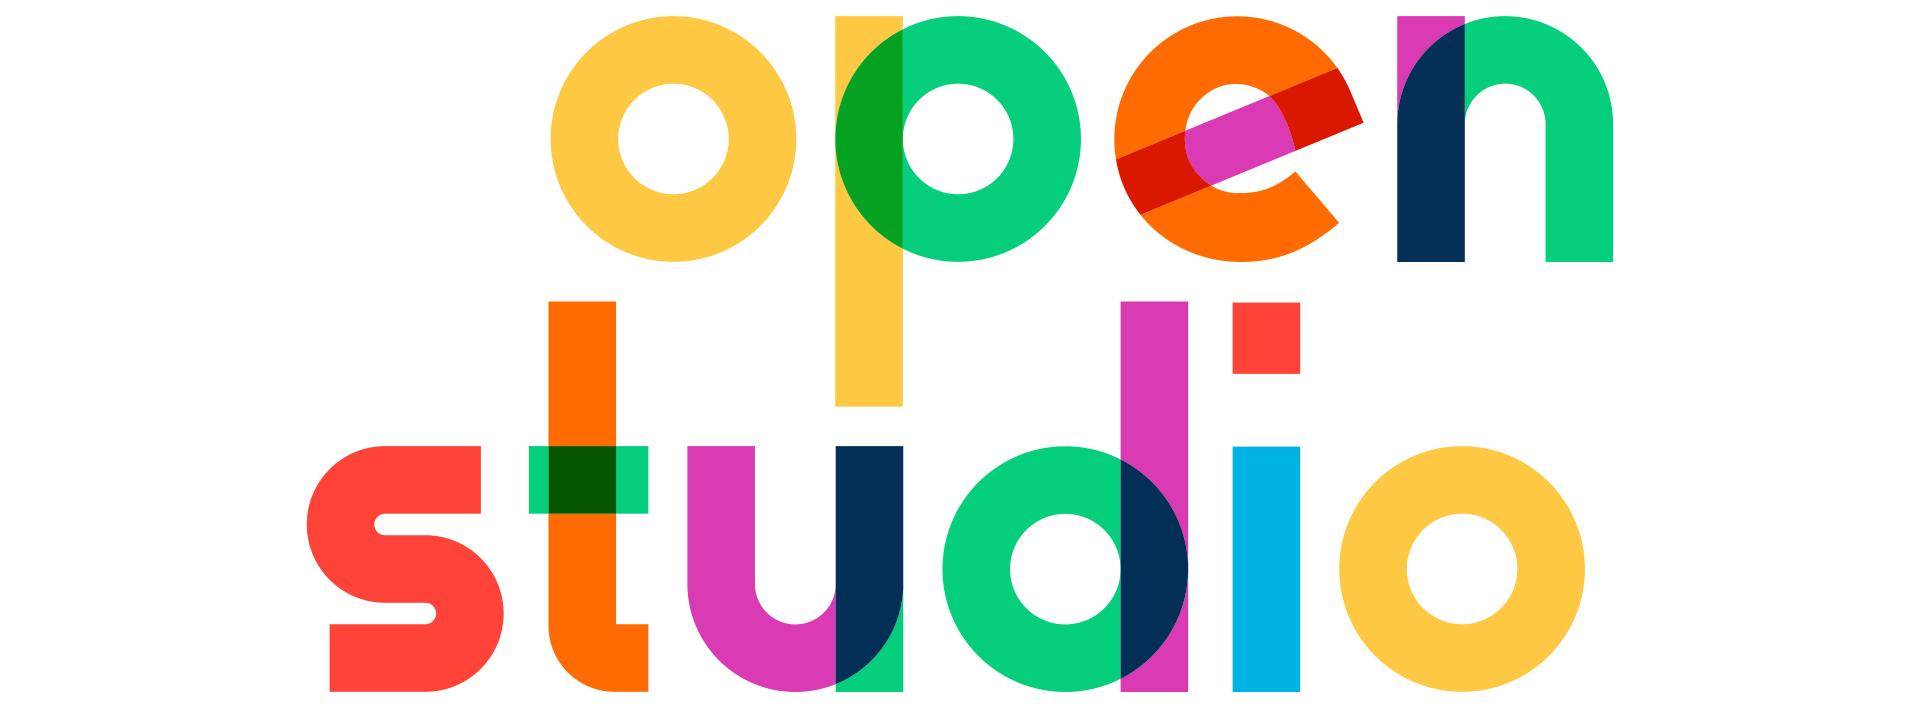 Open Studio Banner multicolor words 22open studio22 on white background